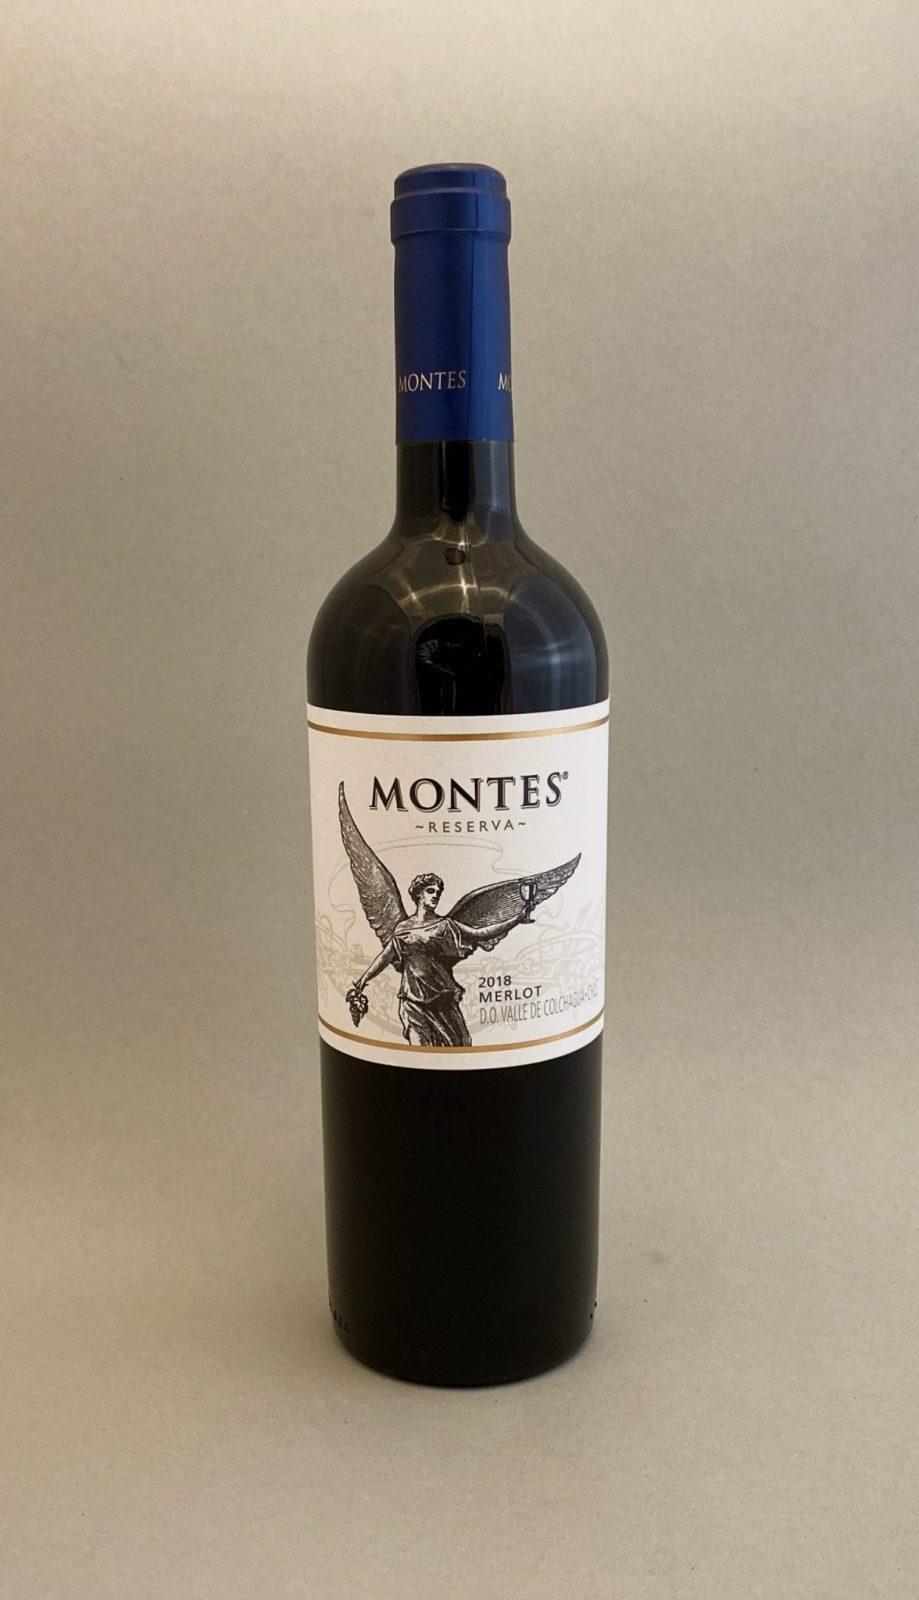 MONTES Merlot Reserva 2018, vinoteka Sunny wines slnecnice mesto, Bratislava petrzalka, vino červené z Chille